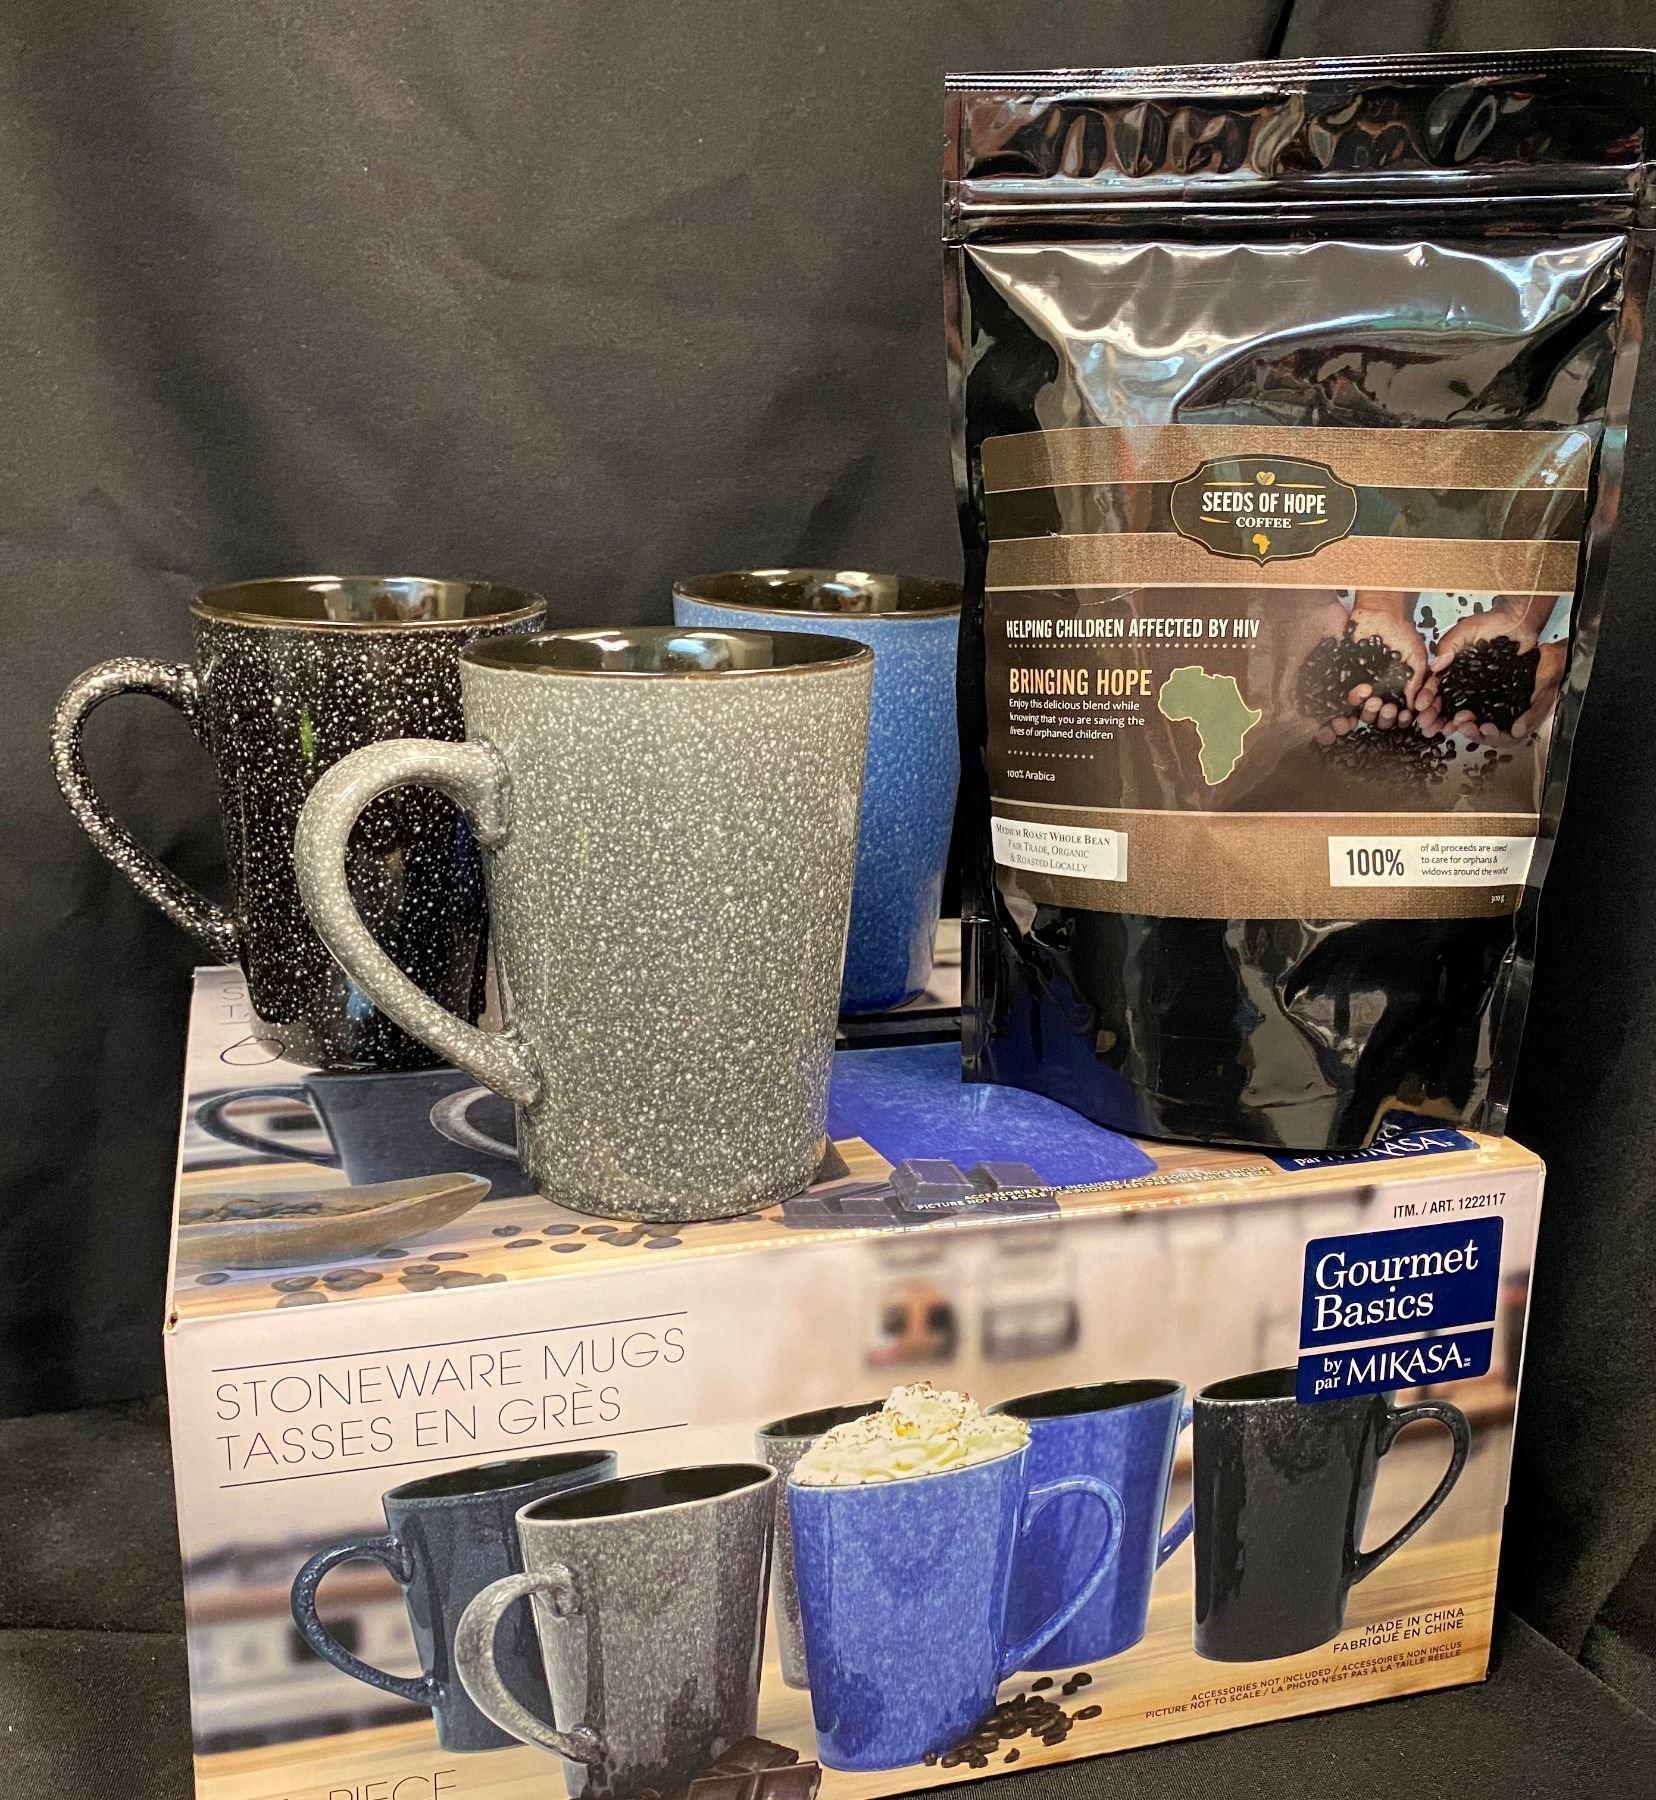 Mikasa Stoneware Mugs